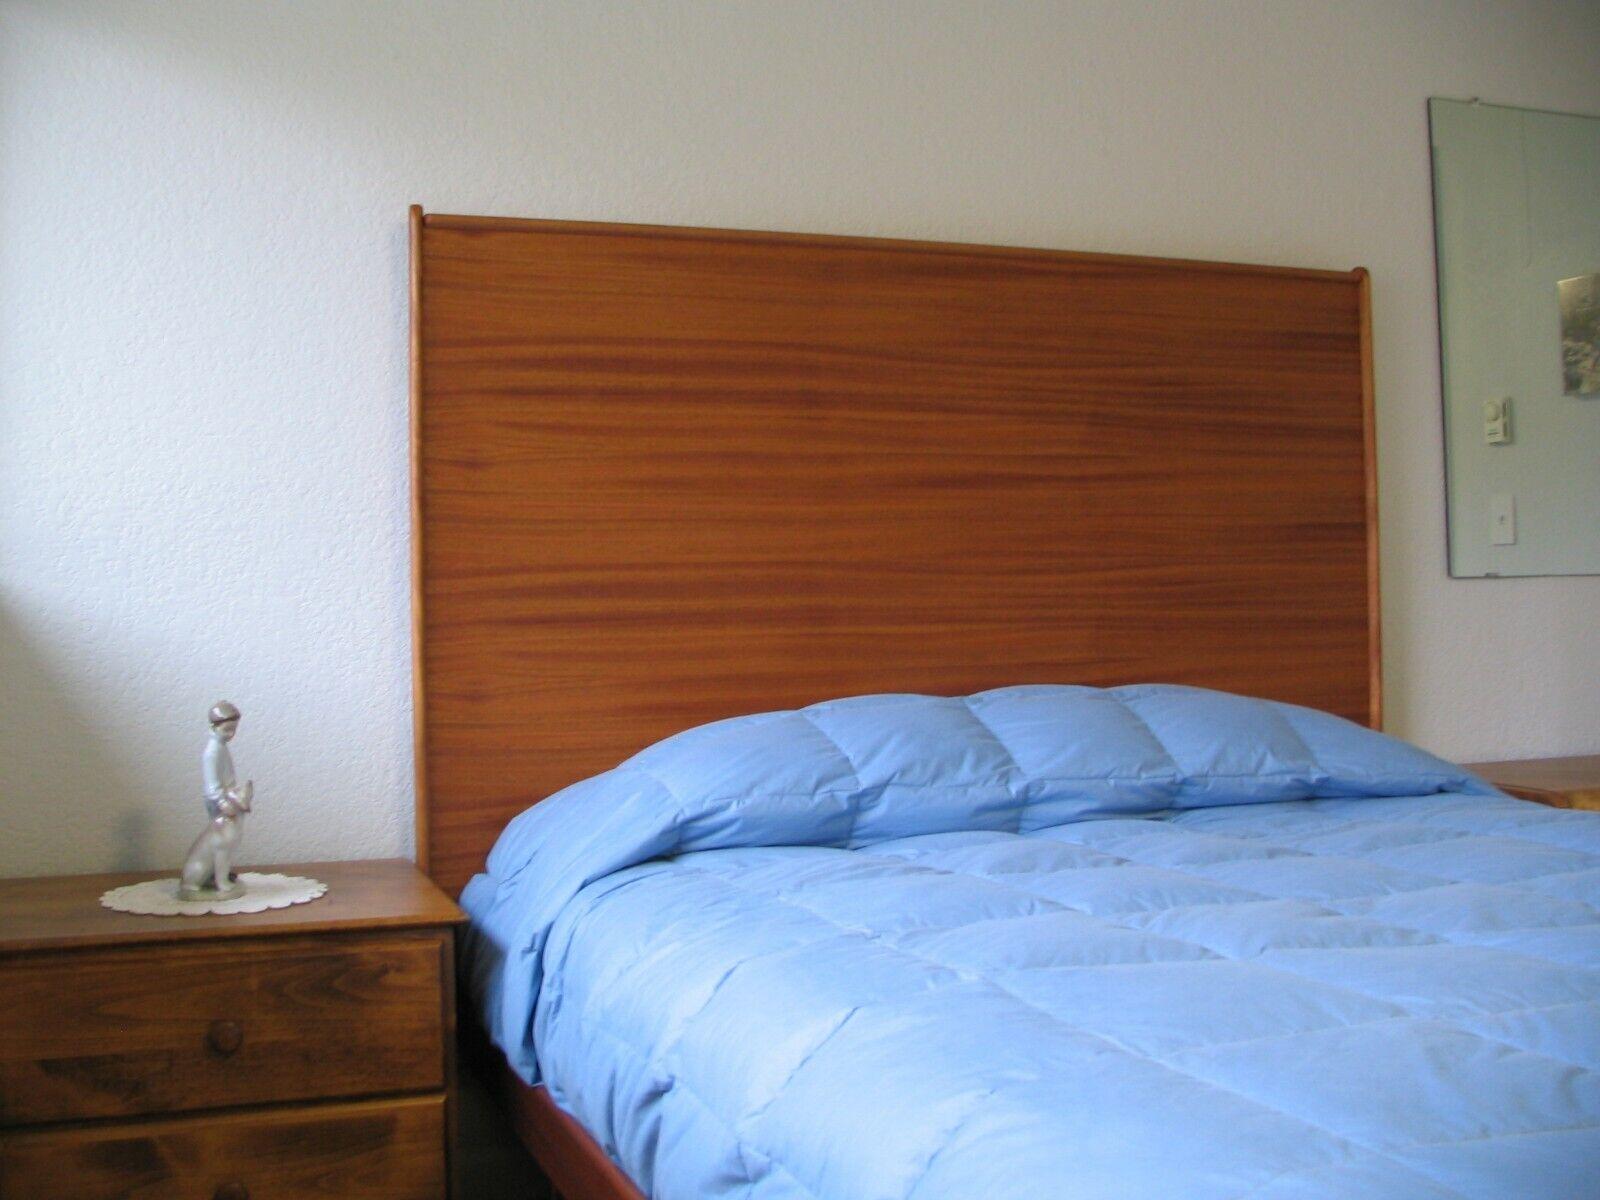 headboard mahogany wood scandinavian with legs